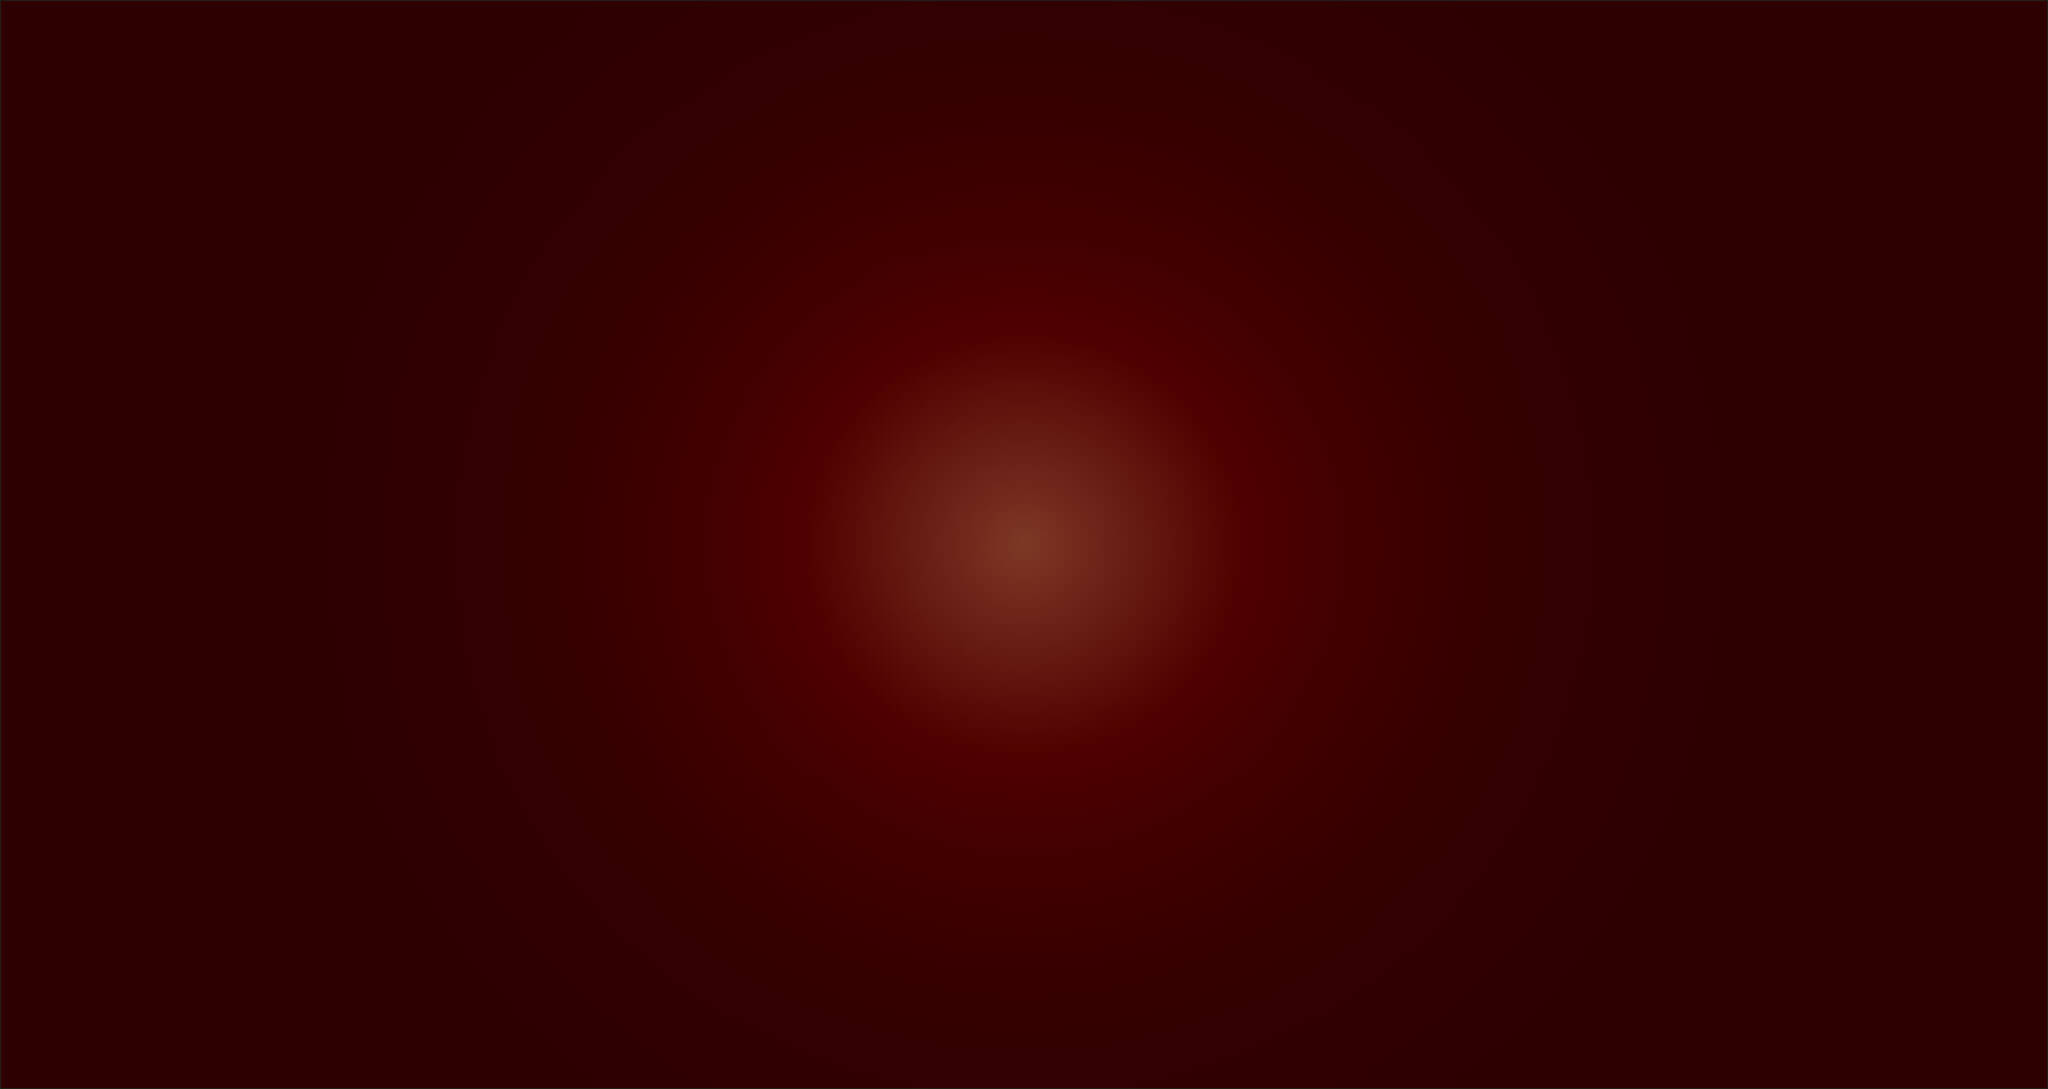 10mfh-background-red2.jpg